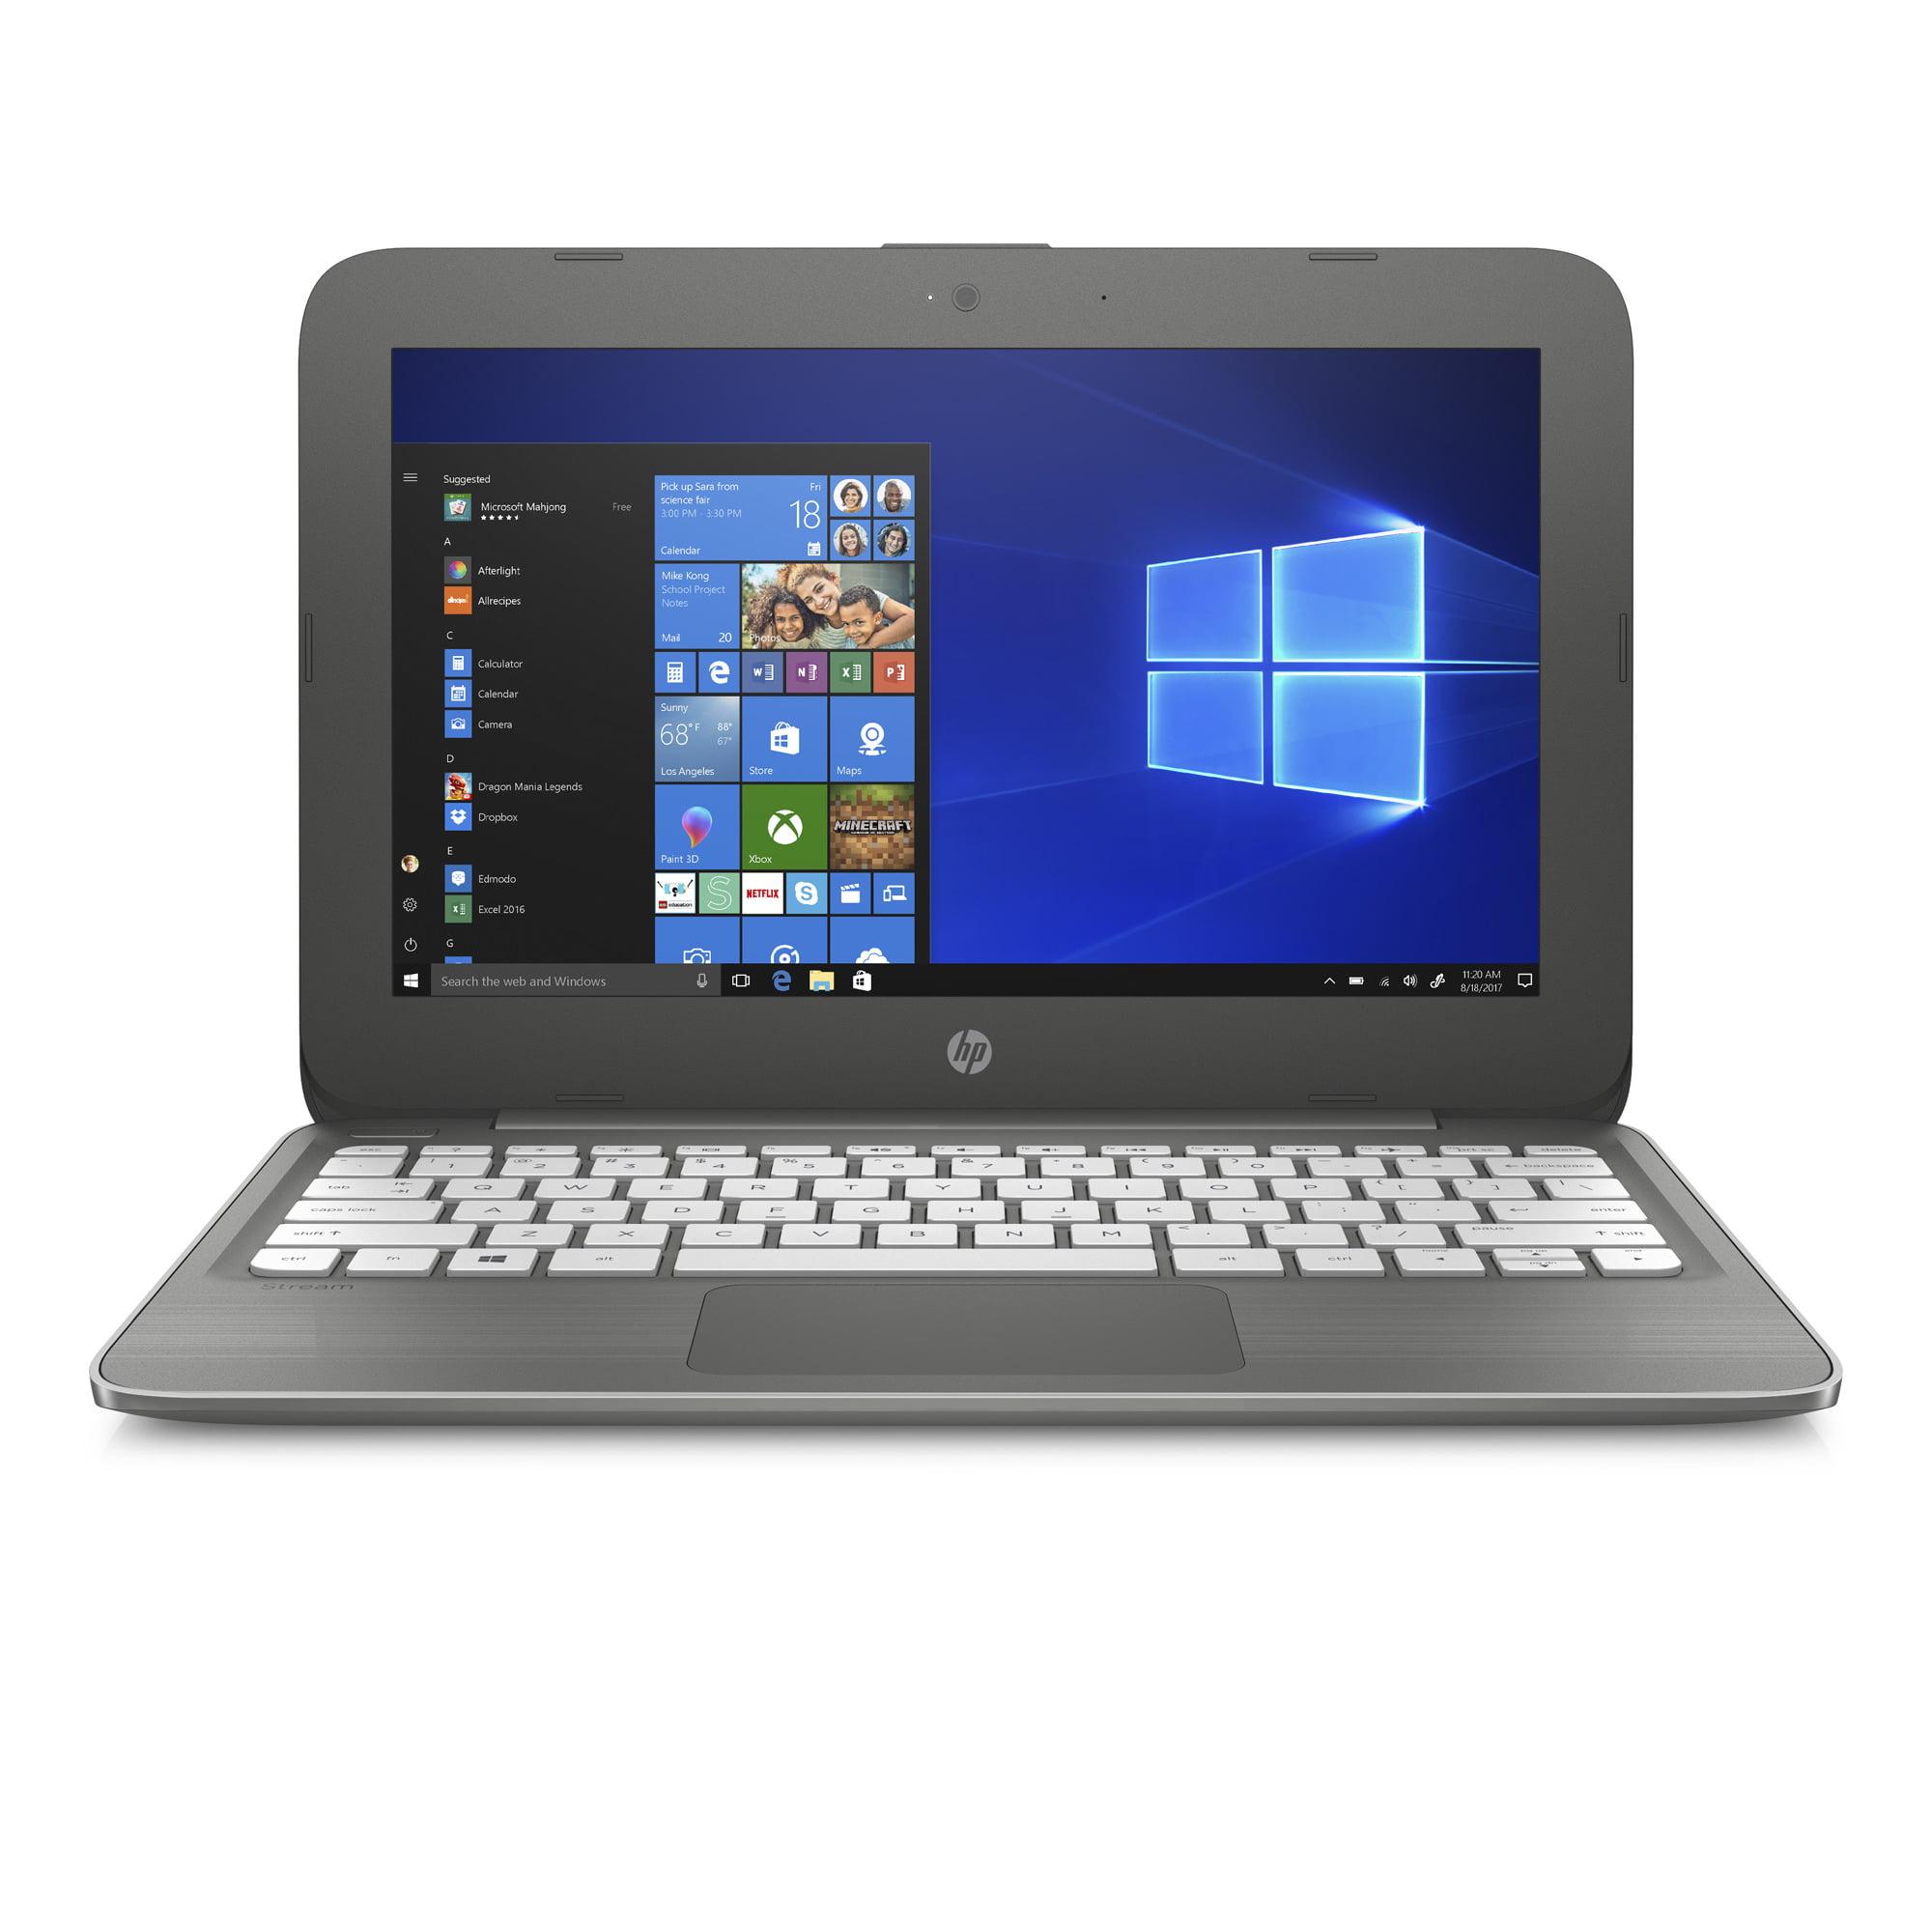 HP Stream Laptop 14-cb060nr, Celeron N3060, 4GB DDR3L, 64GB Emmc, Intel HD Graphics 400, Windows 10 Home in S mode, Smoke Gray